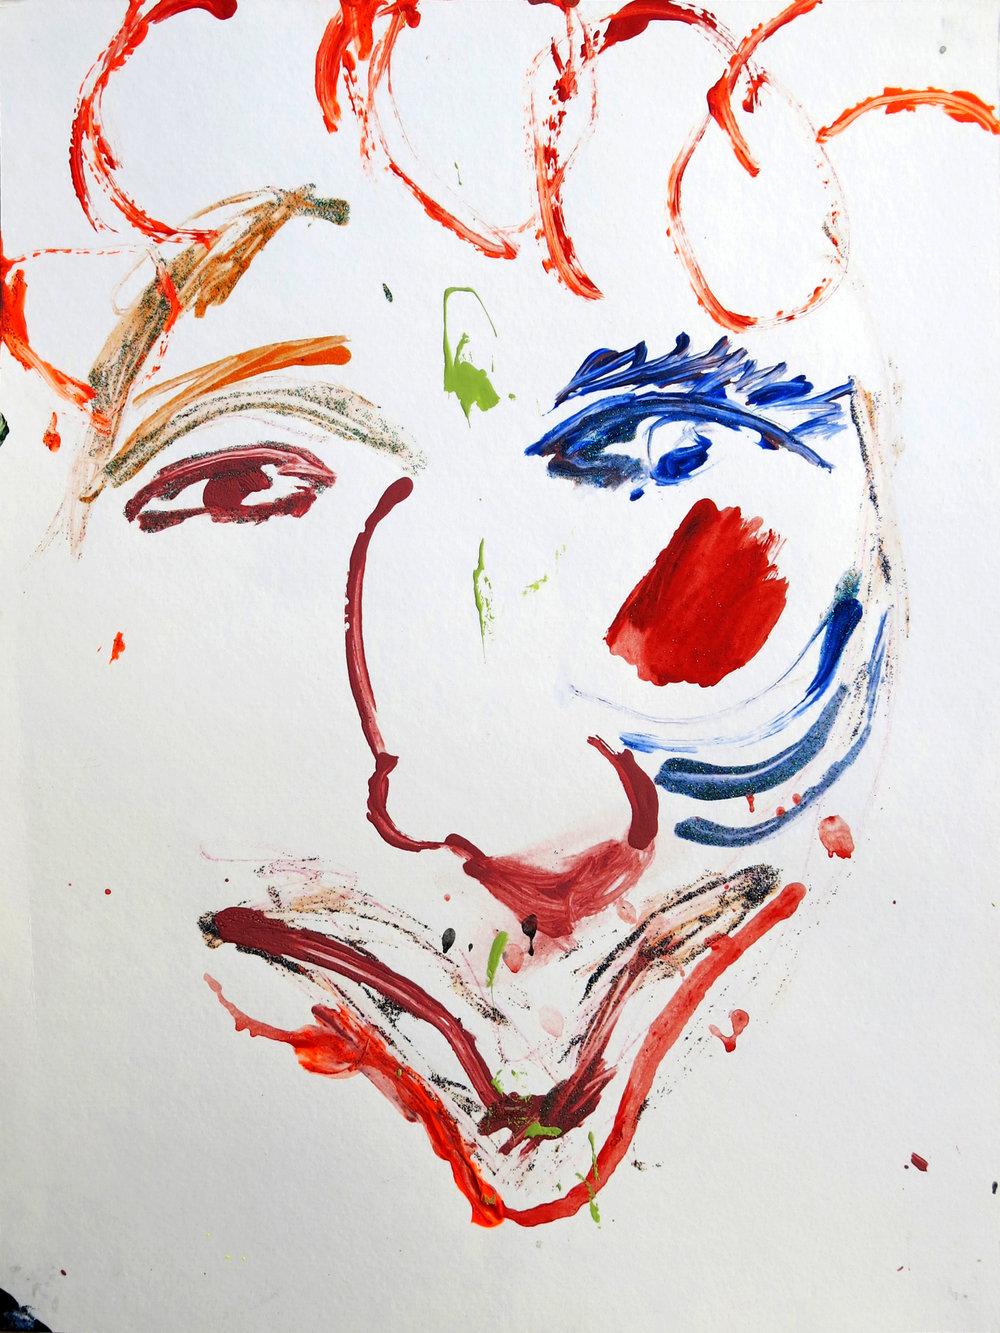 Barbra Streisand Portrait #94